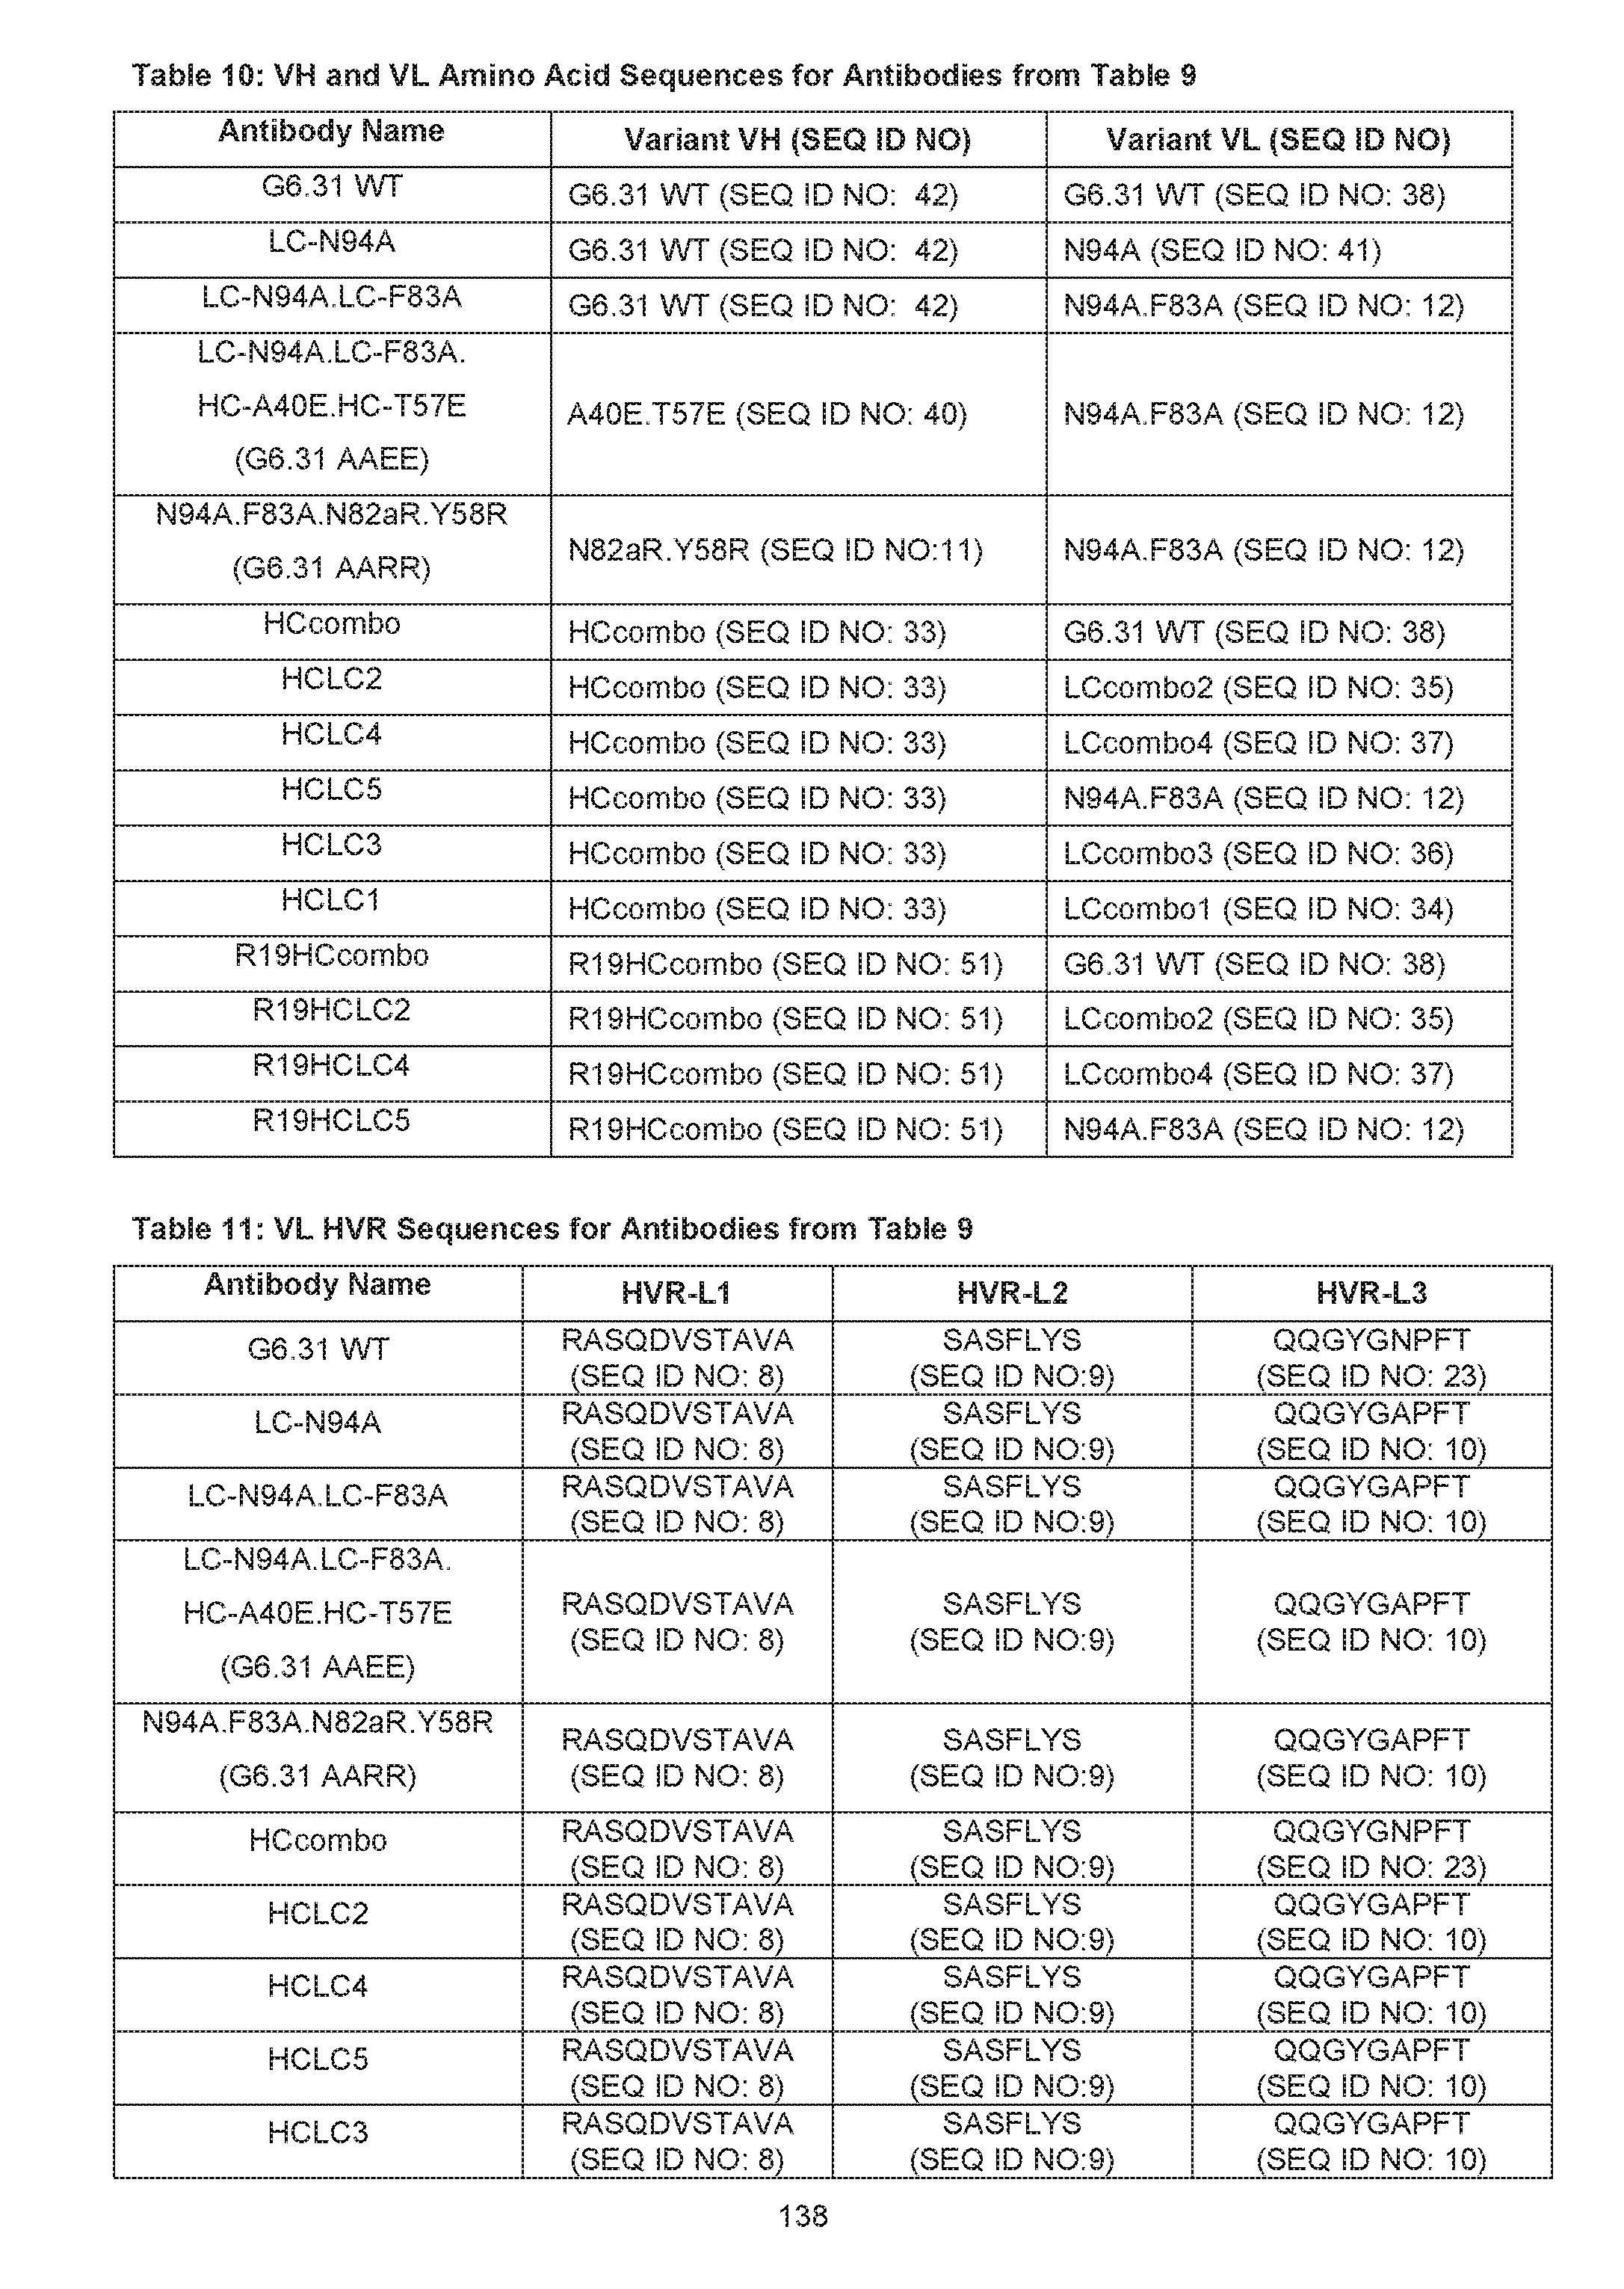 WO2017053807A2 - Optimized variants of anti-vegf antibodies